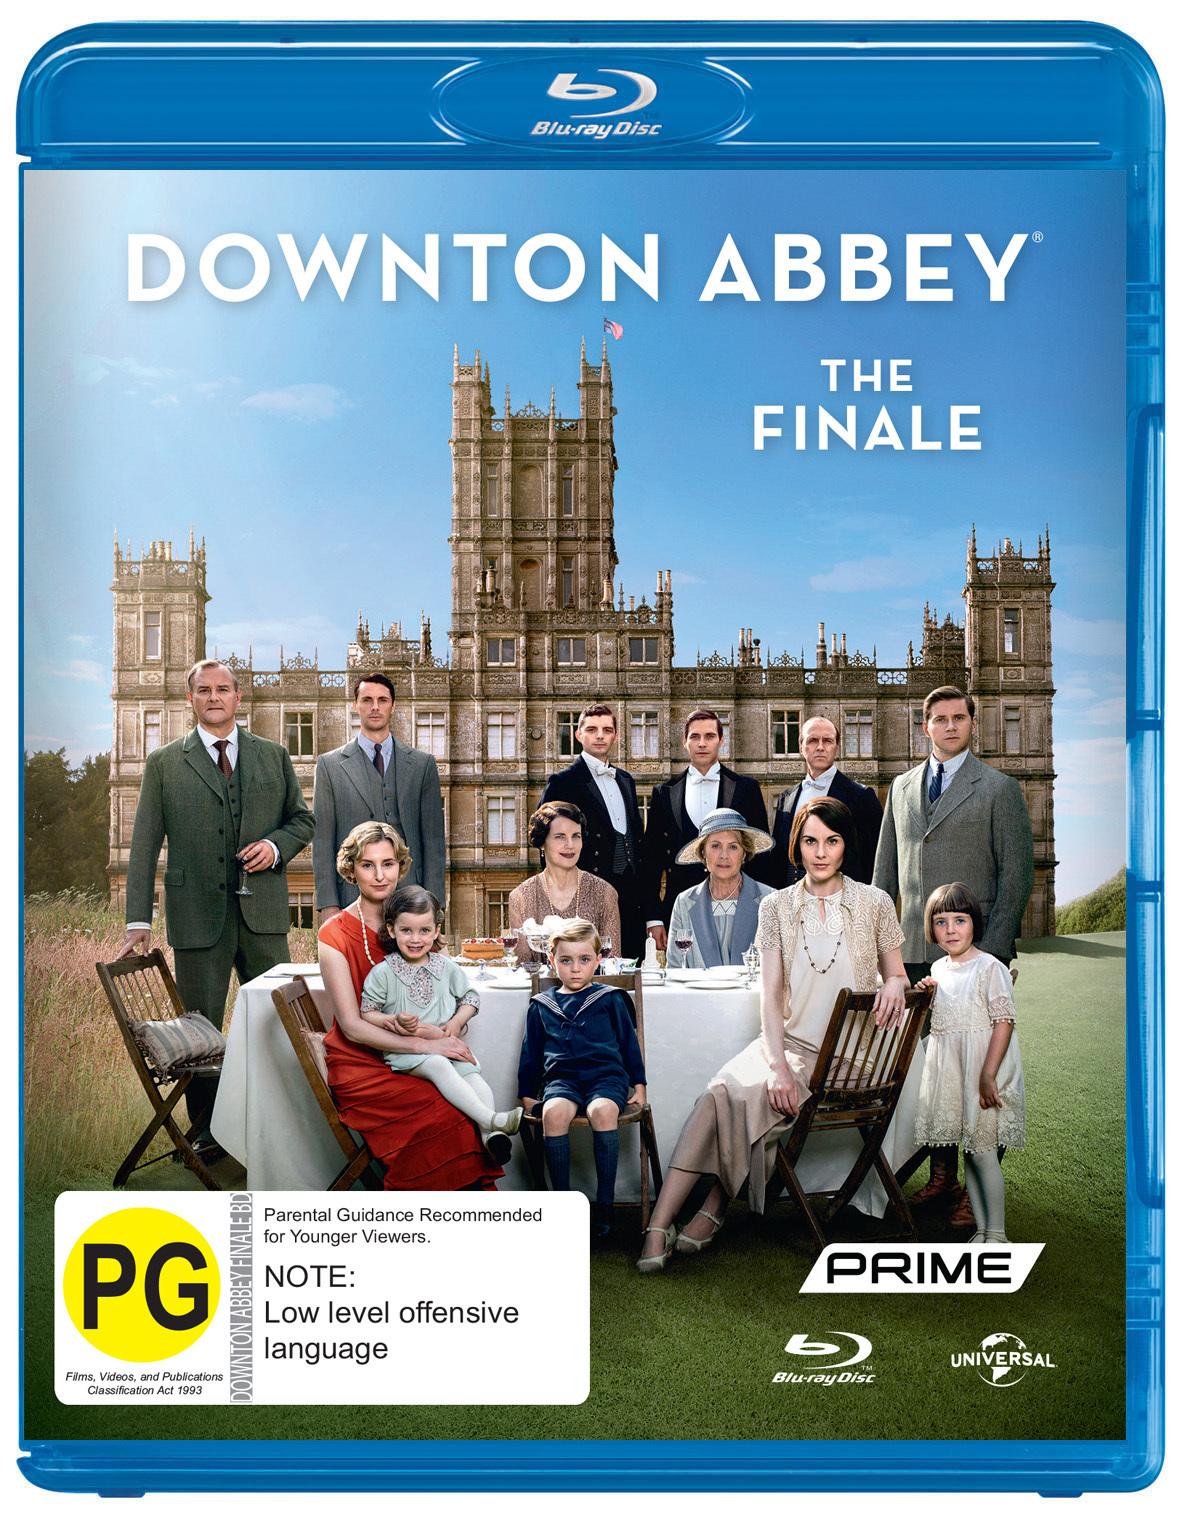 Downton Abbey: Christmas 2015 - Final Episode on Blu-ray image